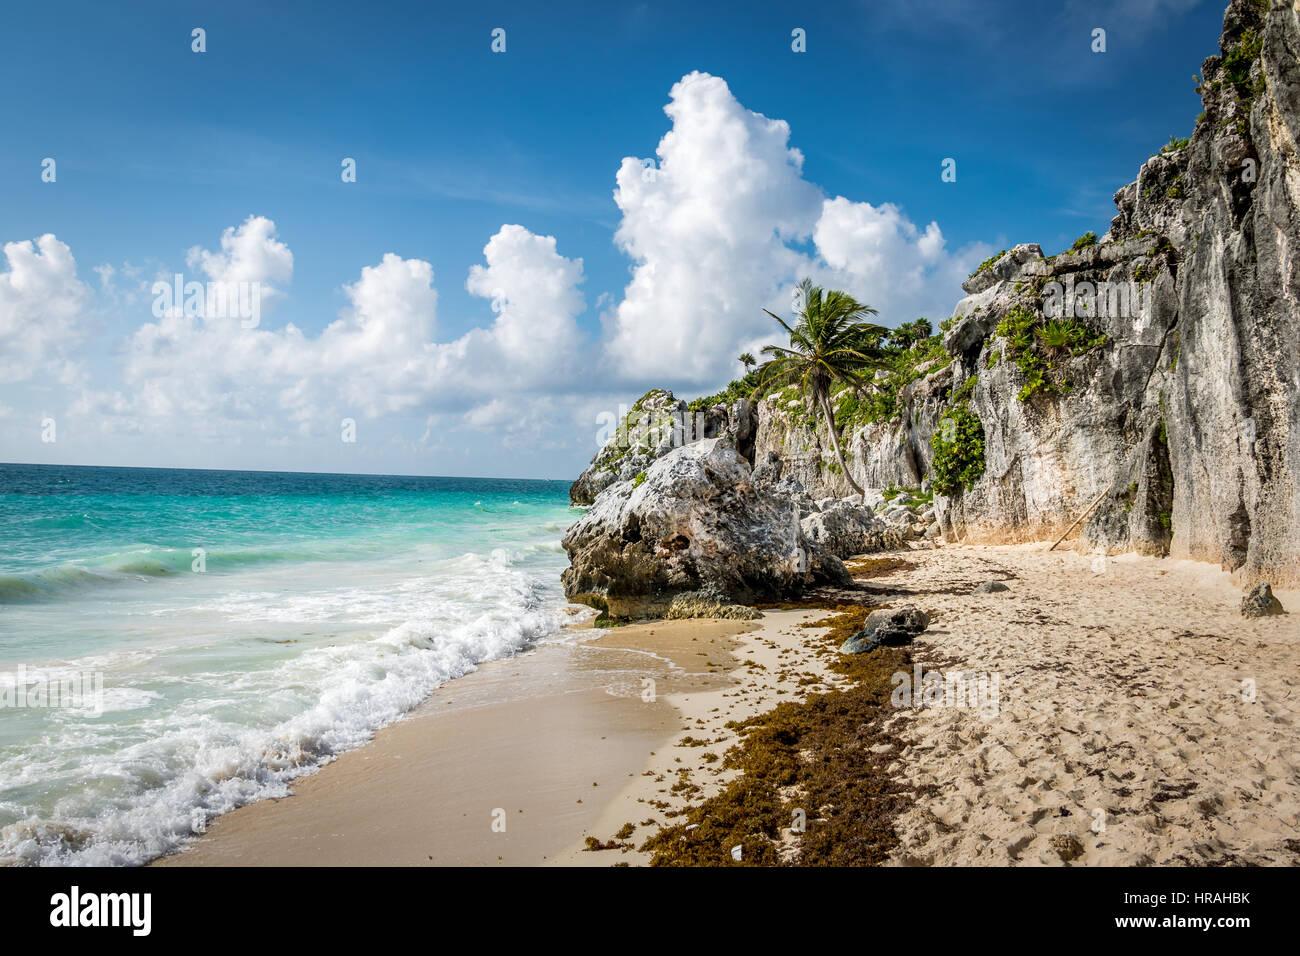 Felsen - Maya-Ruinen von Tulum, Mexiko und Karibik Stockbild